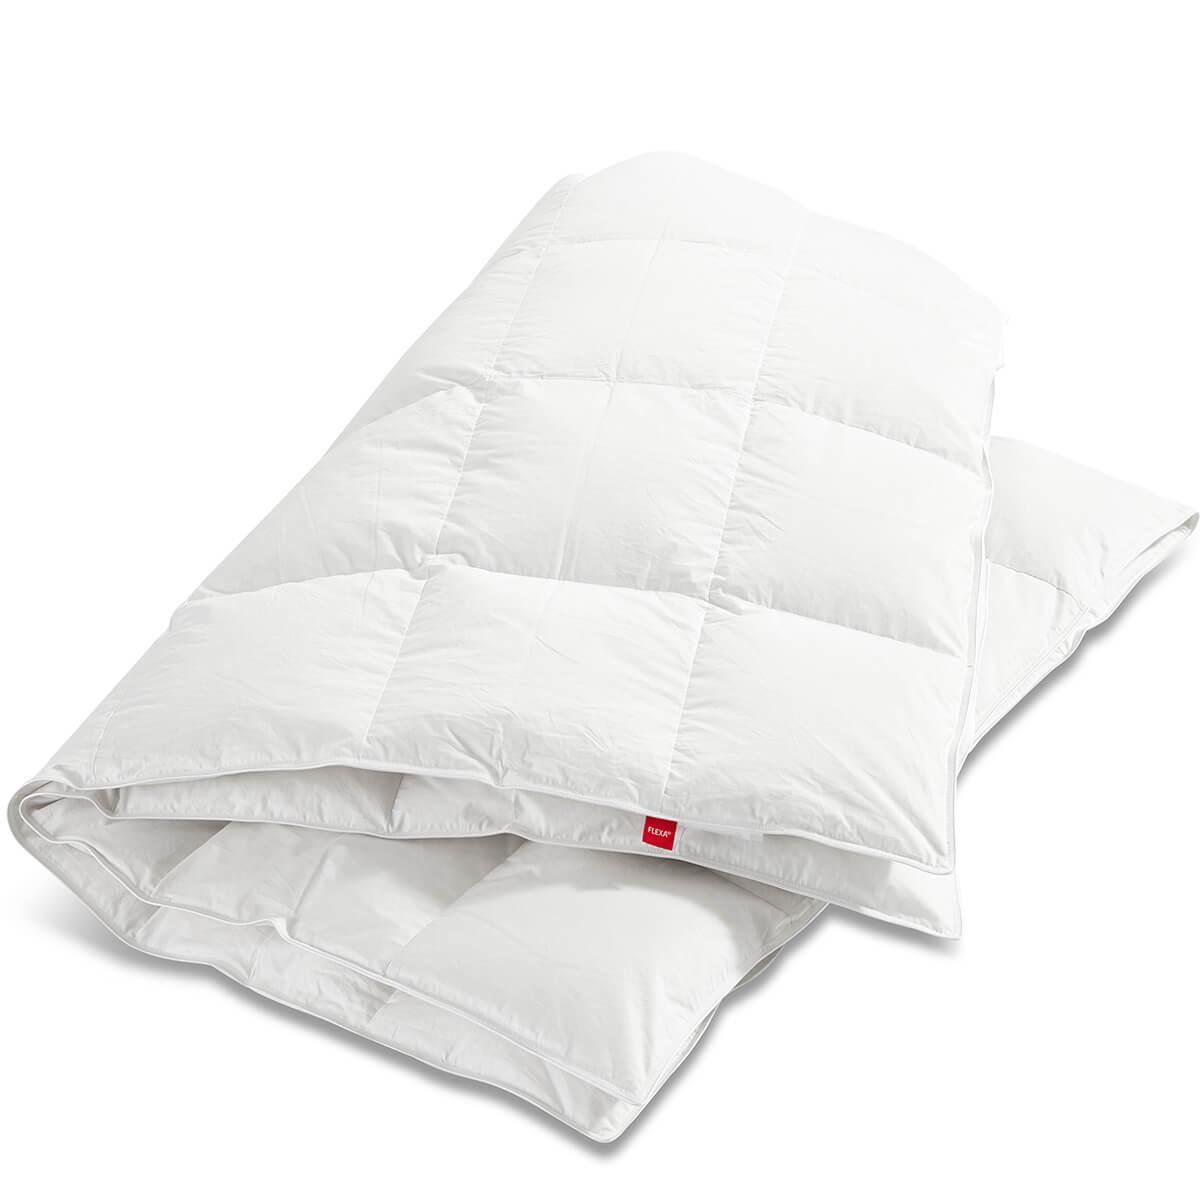 Edredón 140x200cm SLEEP Flexa